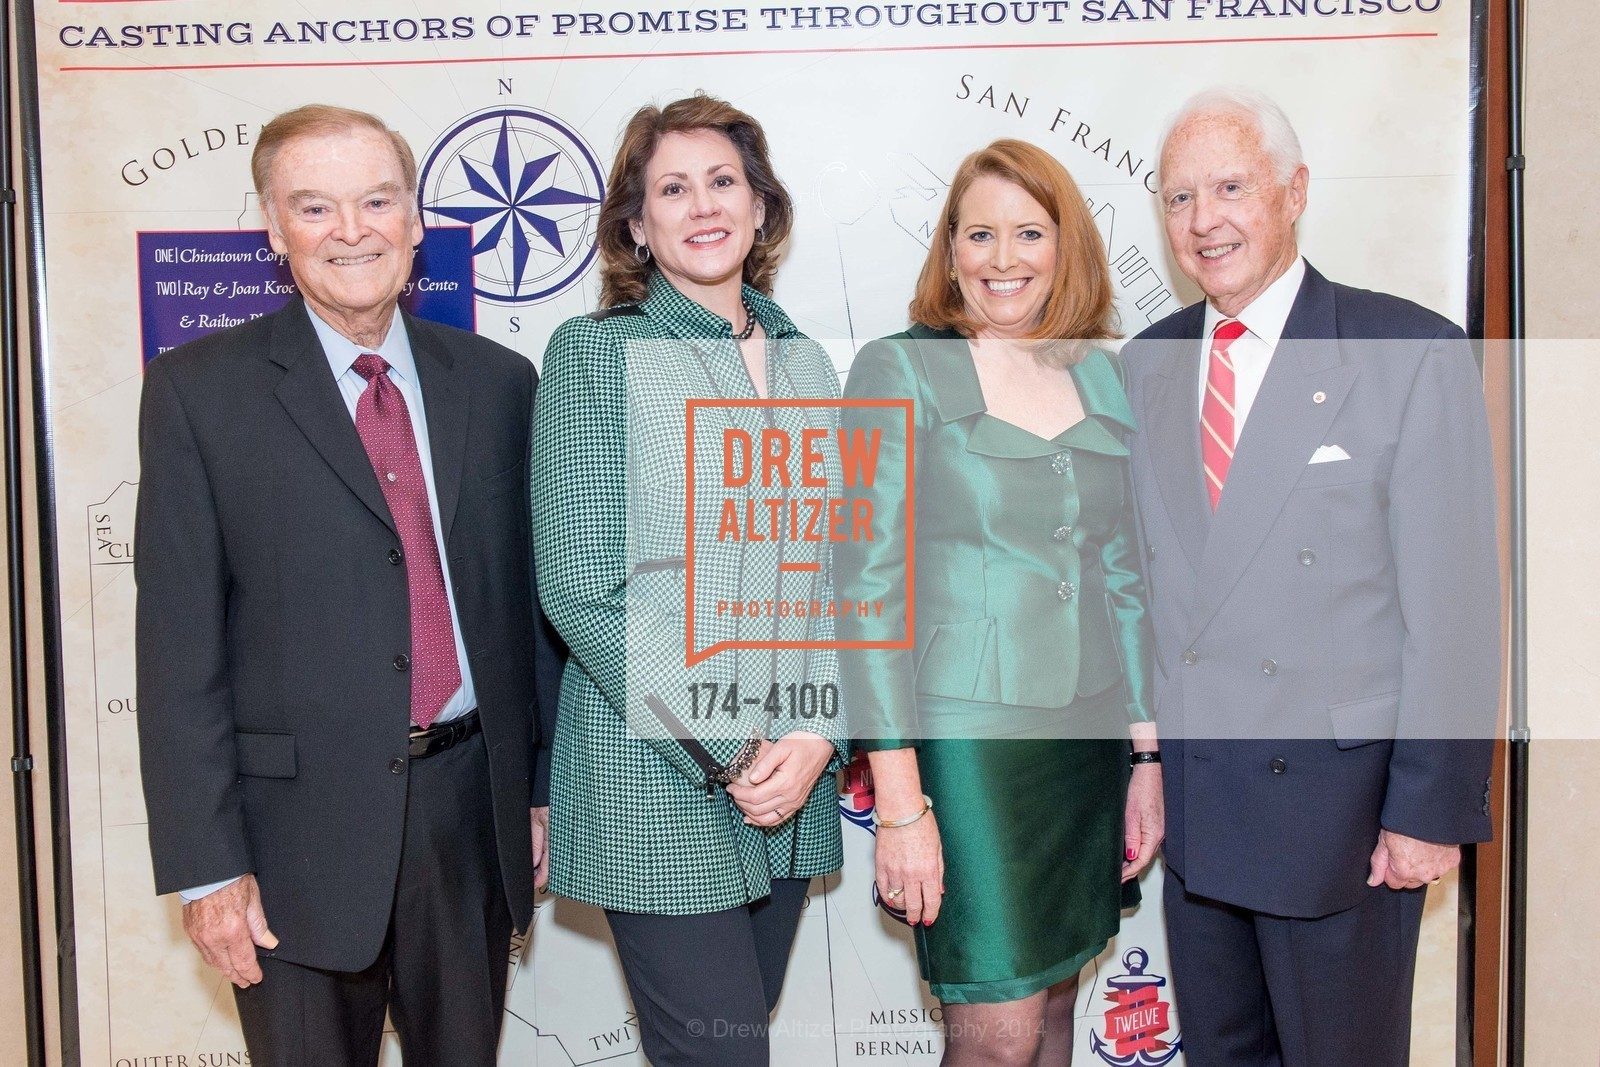 The Honorable Mayor Frank Jordan, Jannine Vaughn, RADM John Bitoff, Photo #174-4100